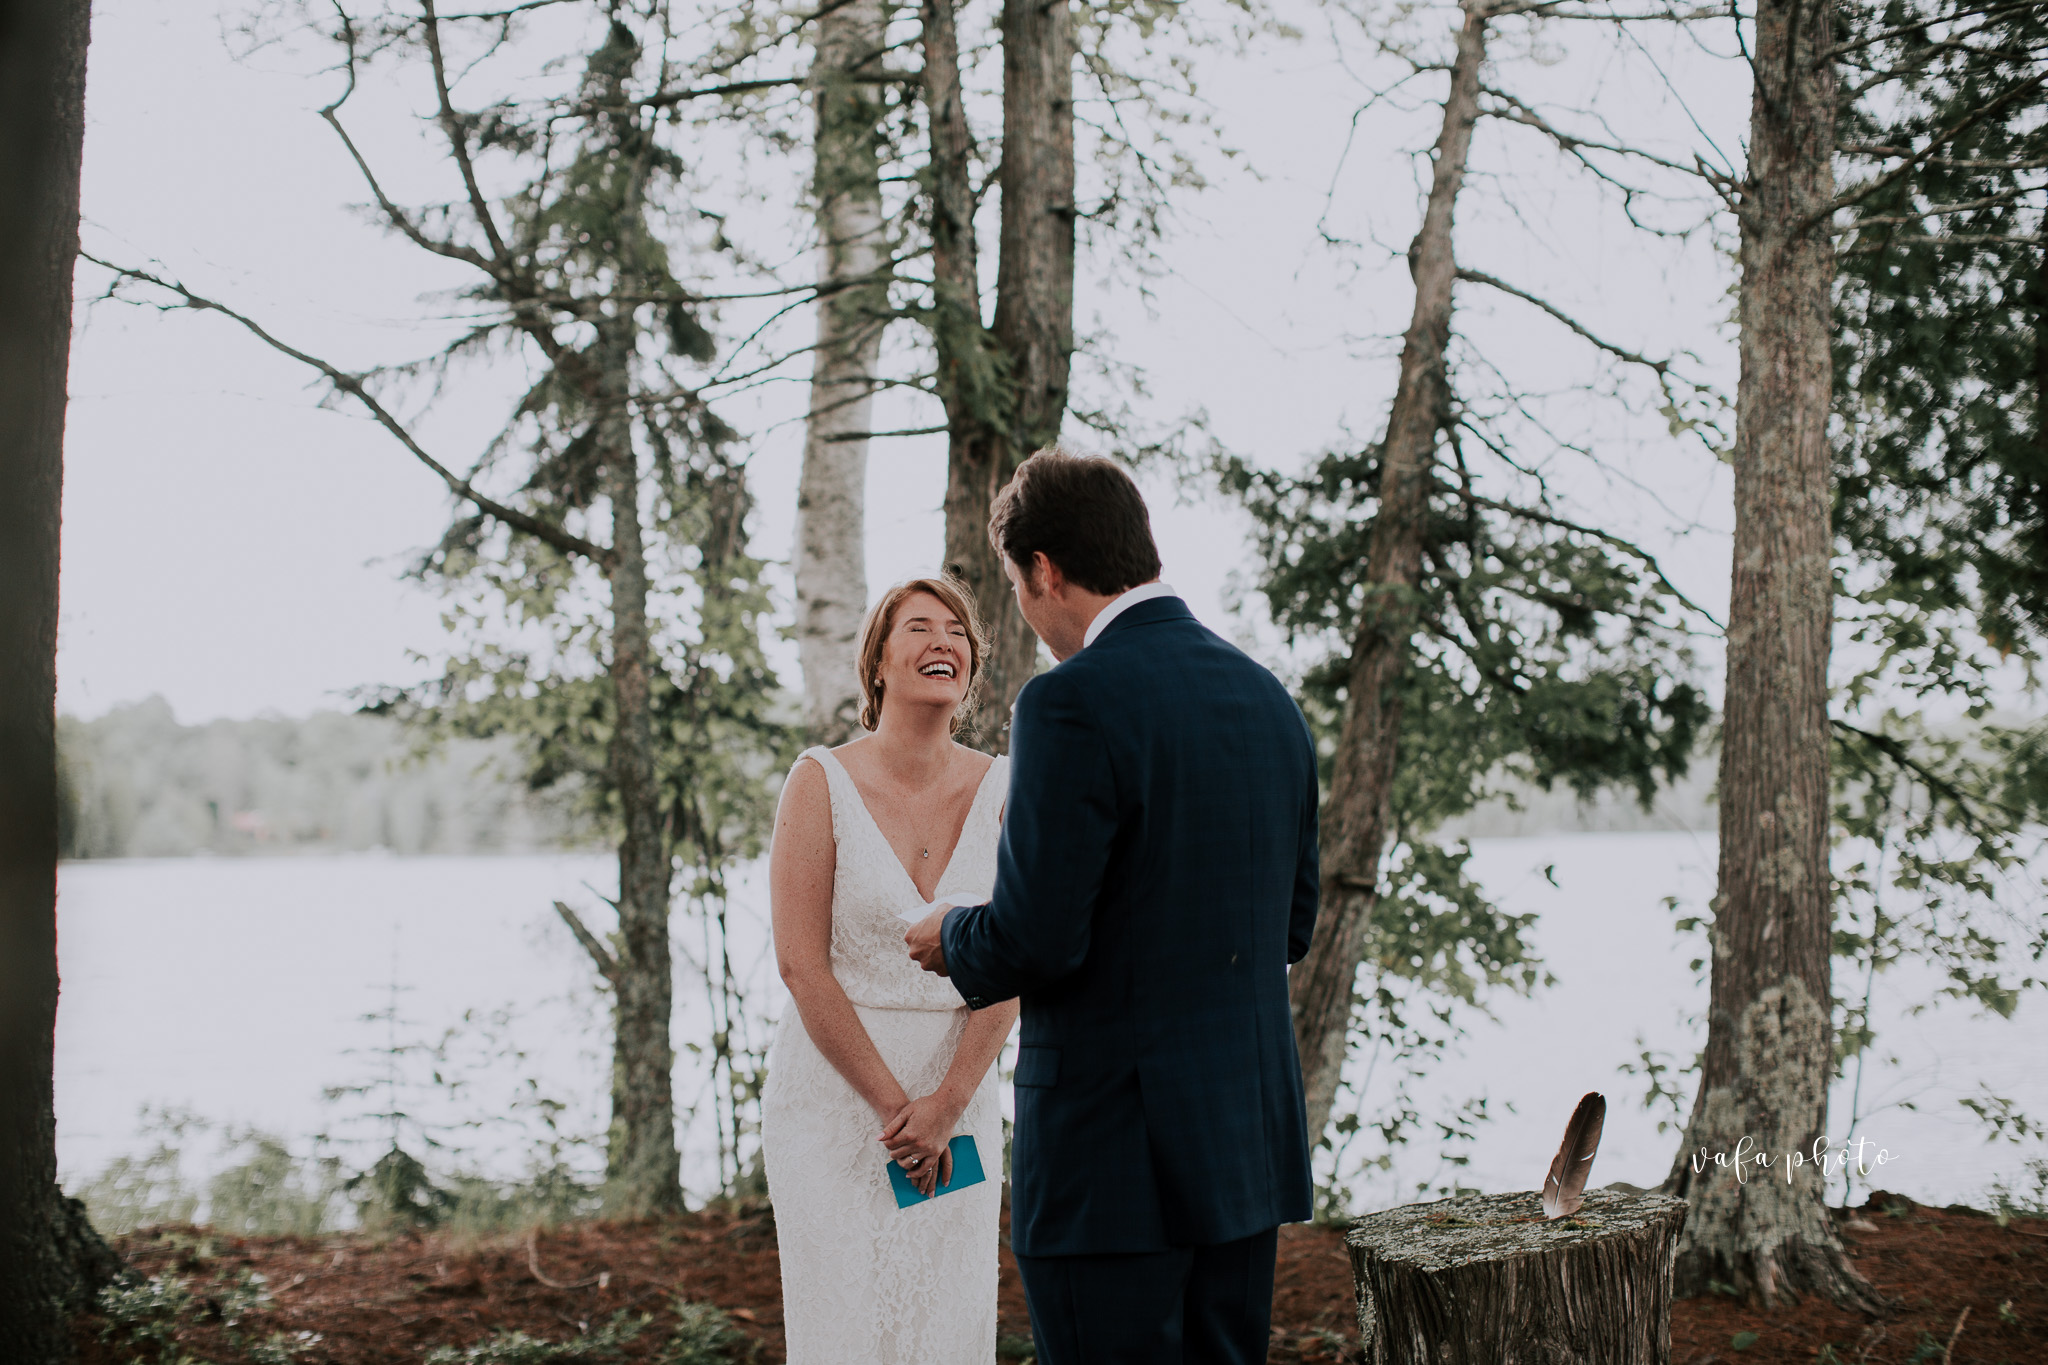 Michigan-Lake-House-Wedding-Madeline-Patrick-Vafa-Photo-334.jpg